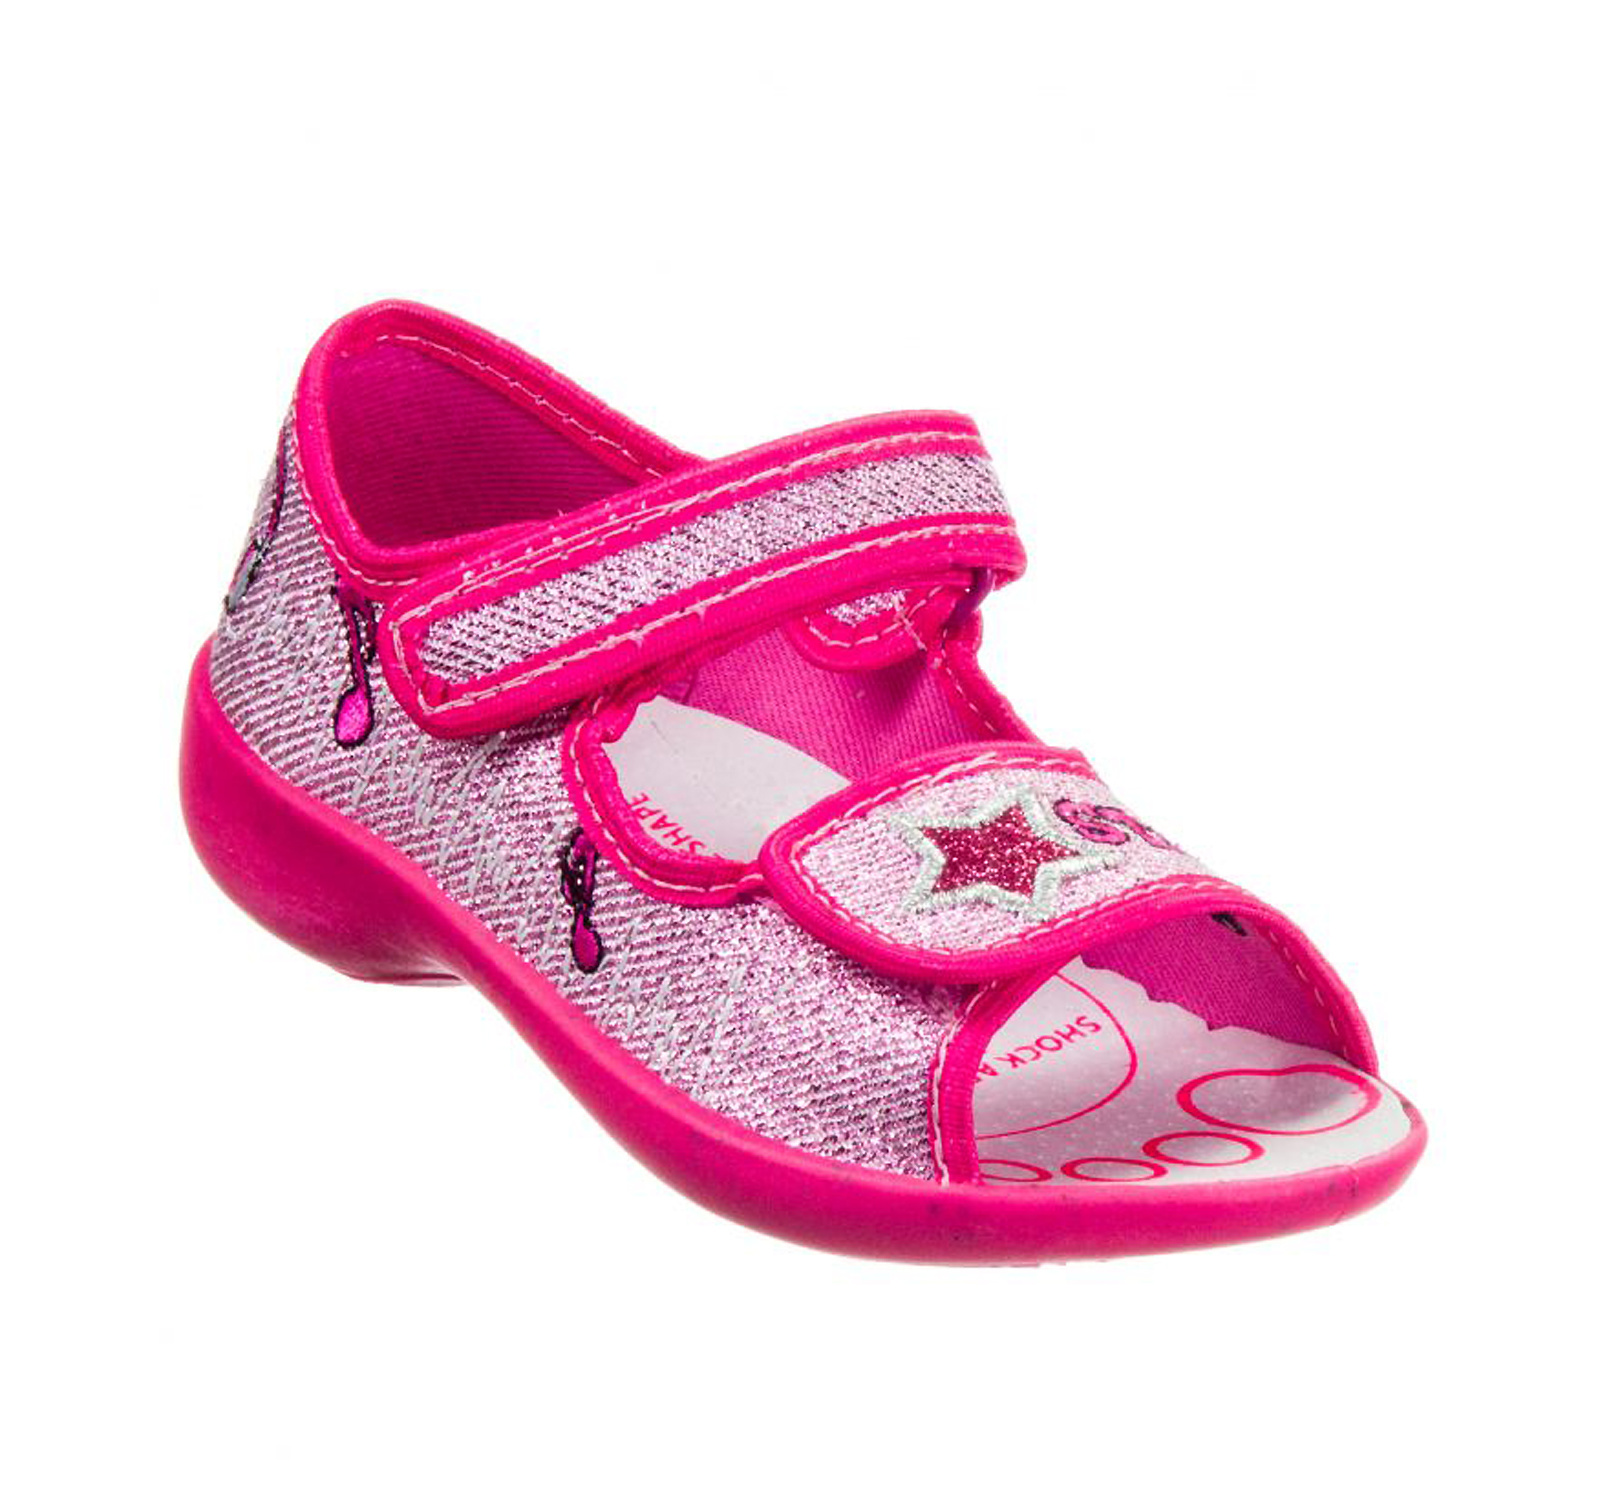 3F® Sandale Maya  Lurex Fuxia